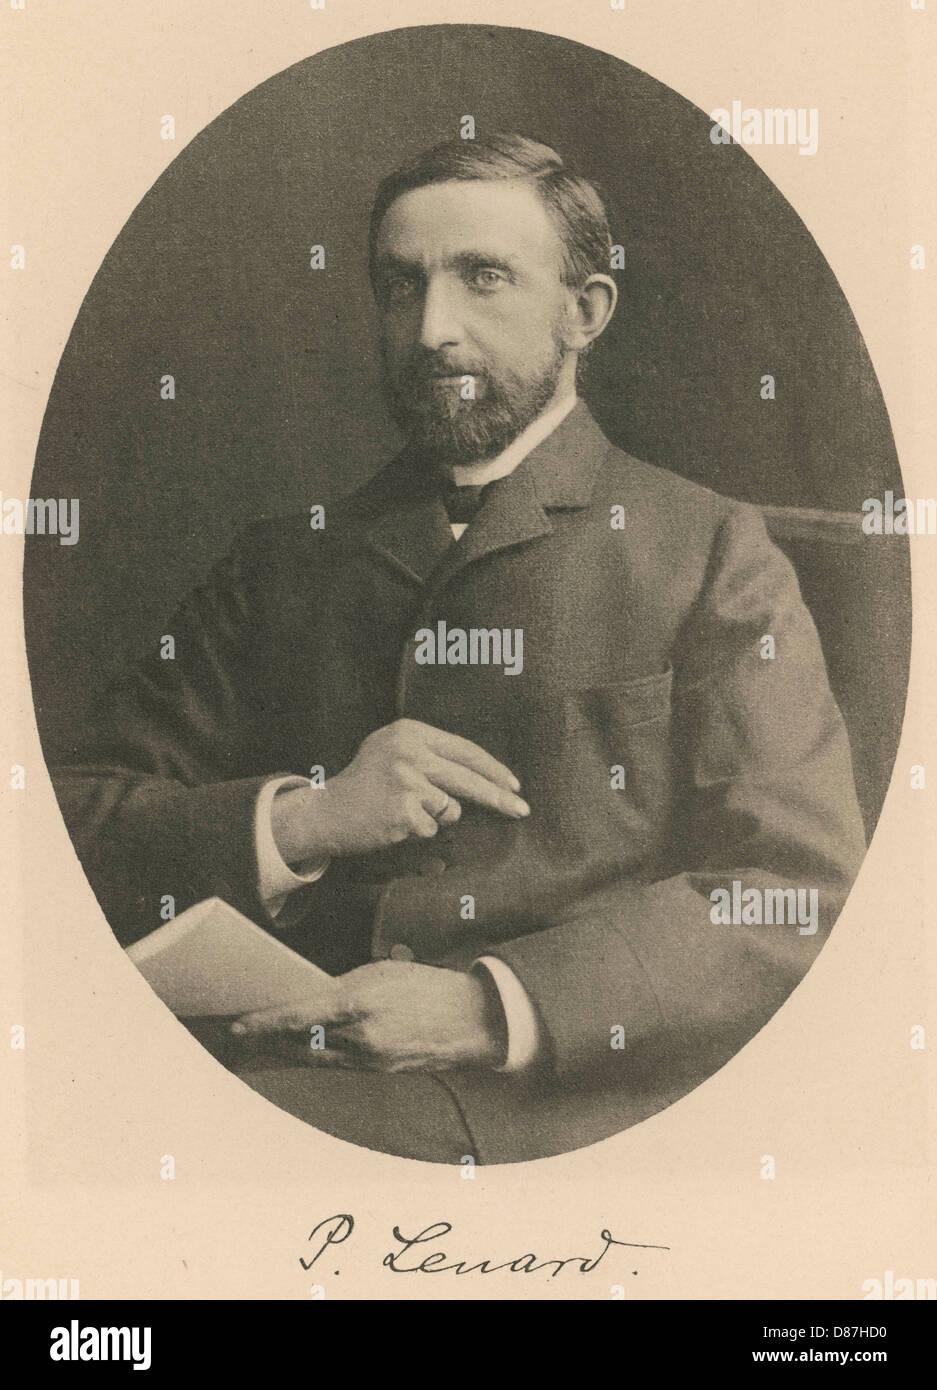 Philipp Lenard Nobel 05 - Stock Image